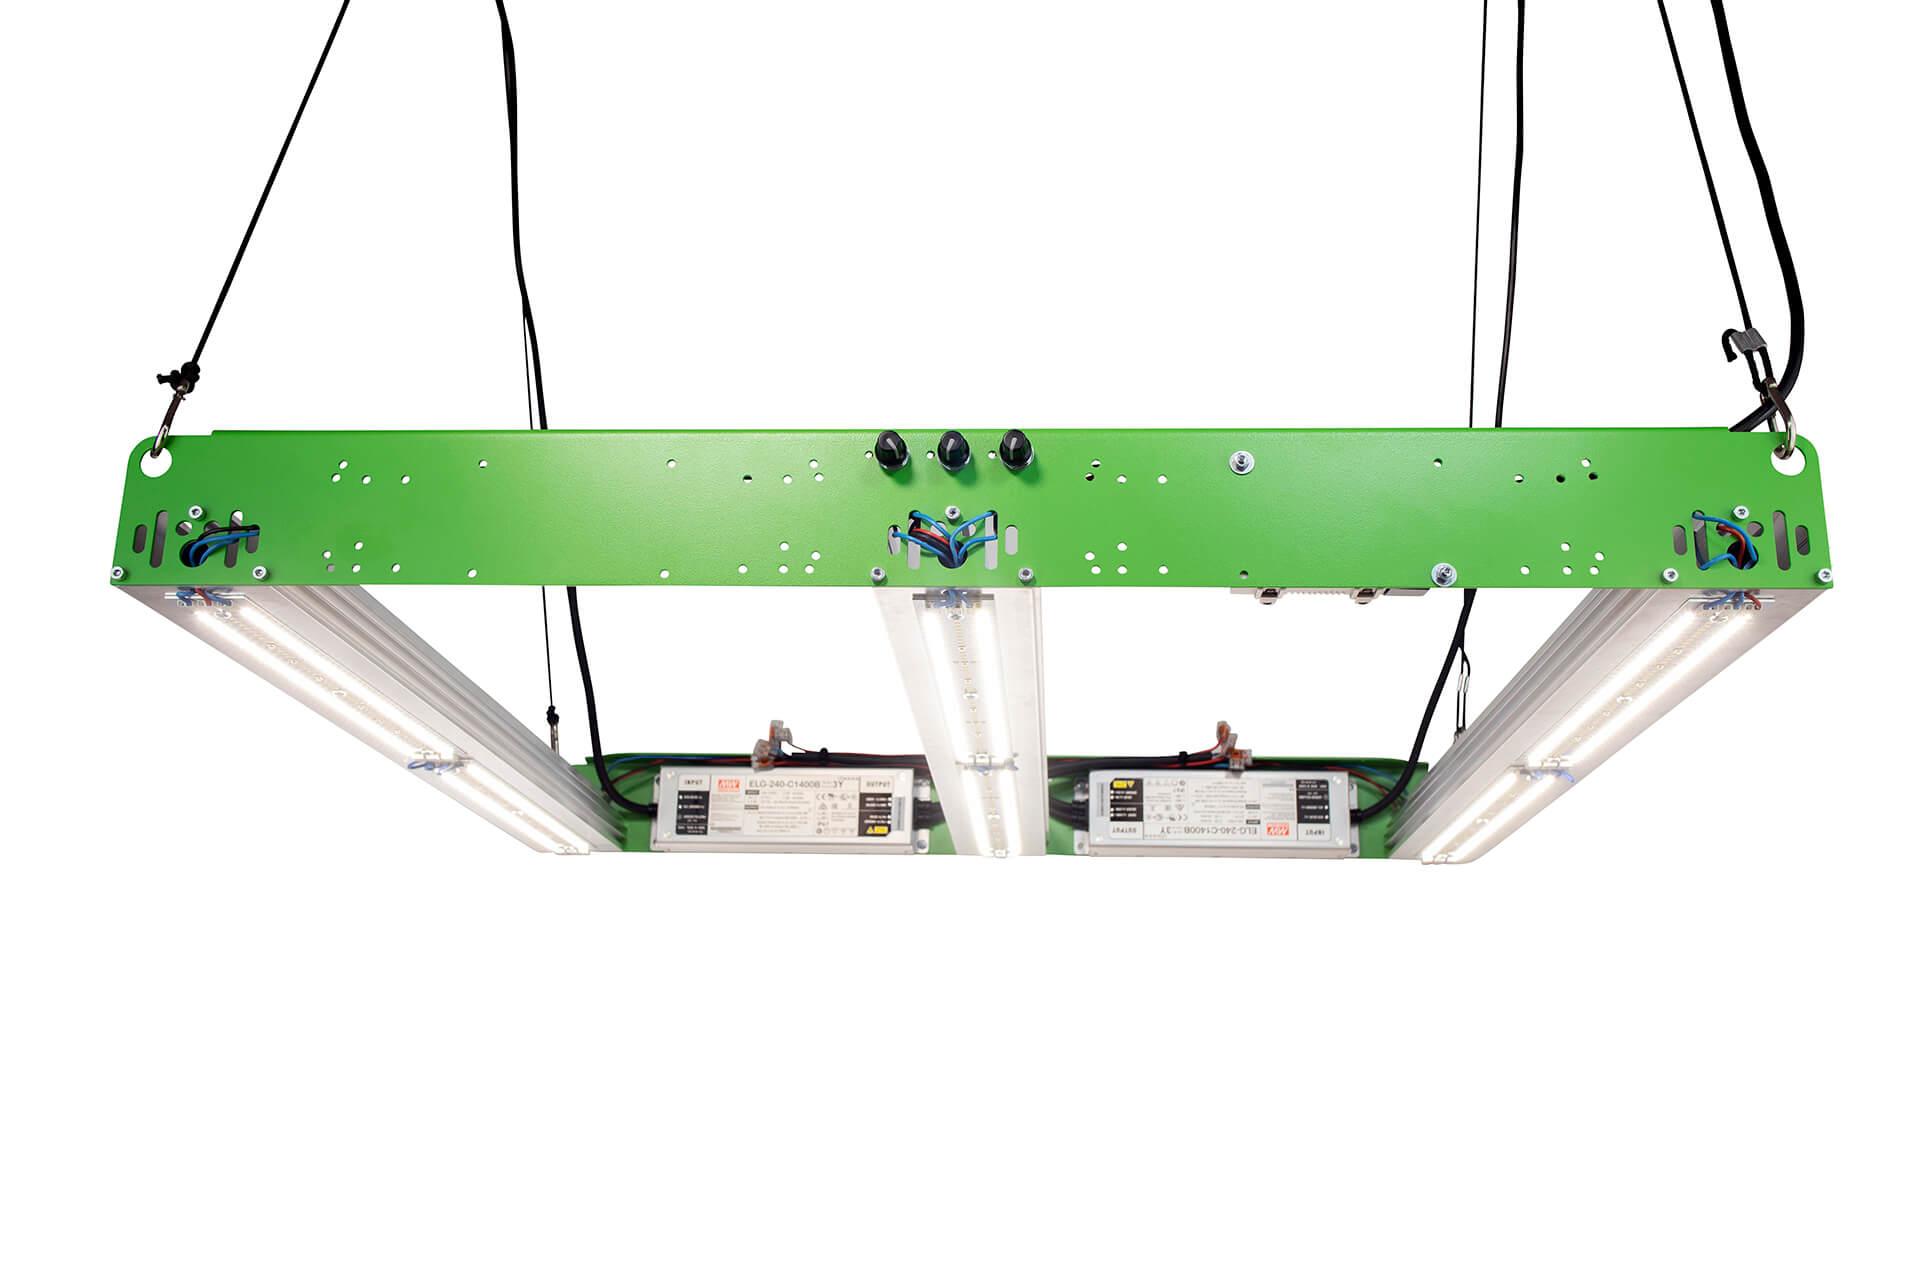 s-DIY-M-KIT-2-series-long-450w-wuchs-channel-on-bottom-up-pro-emit-onlineshop